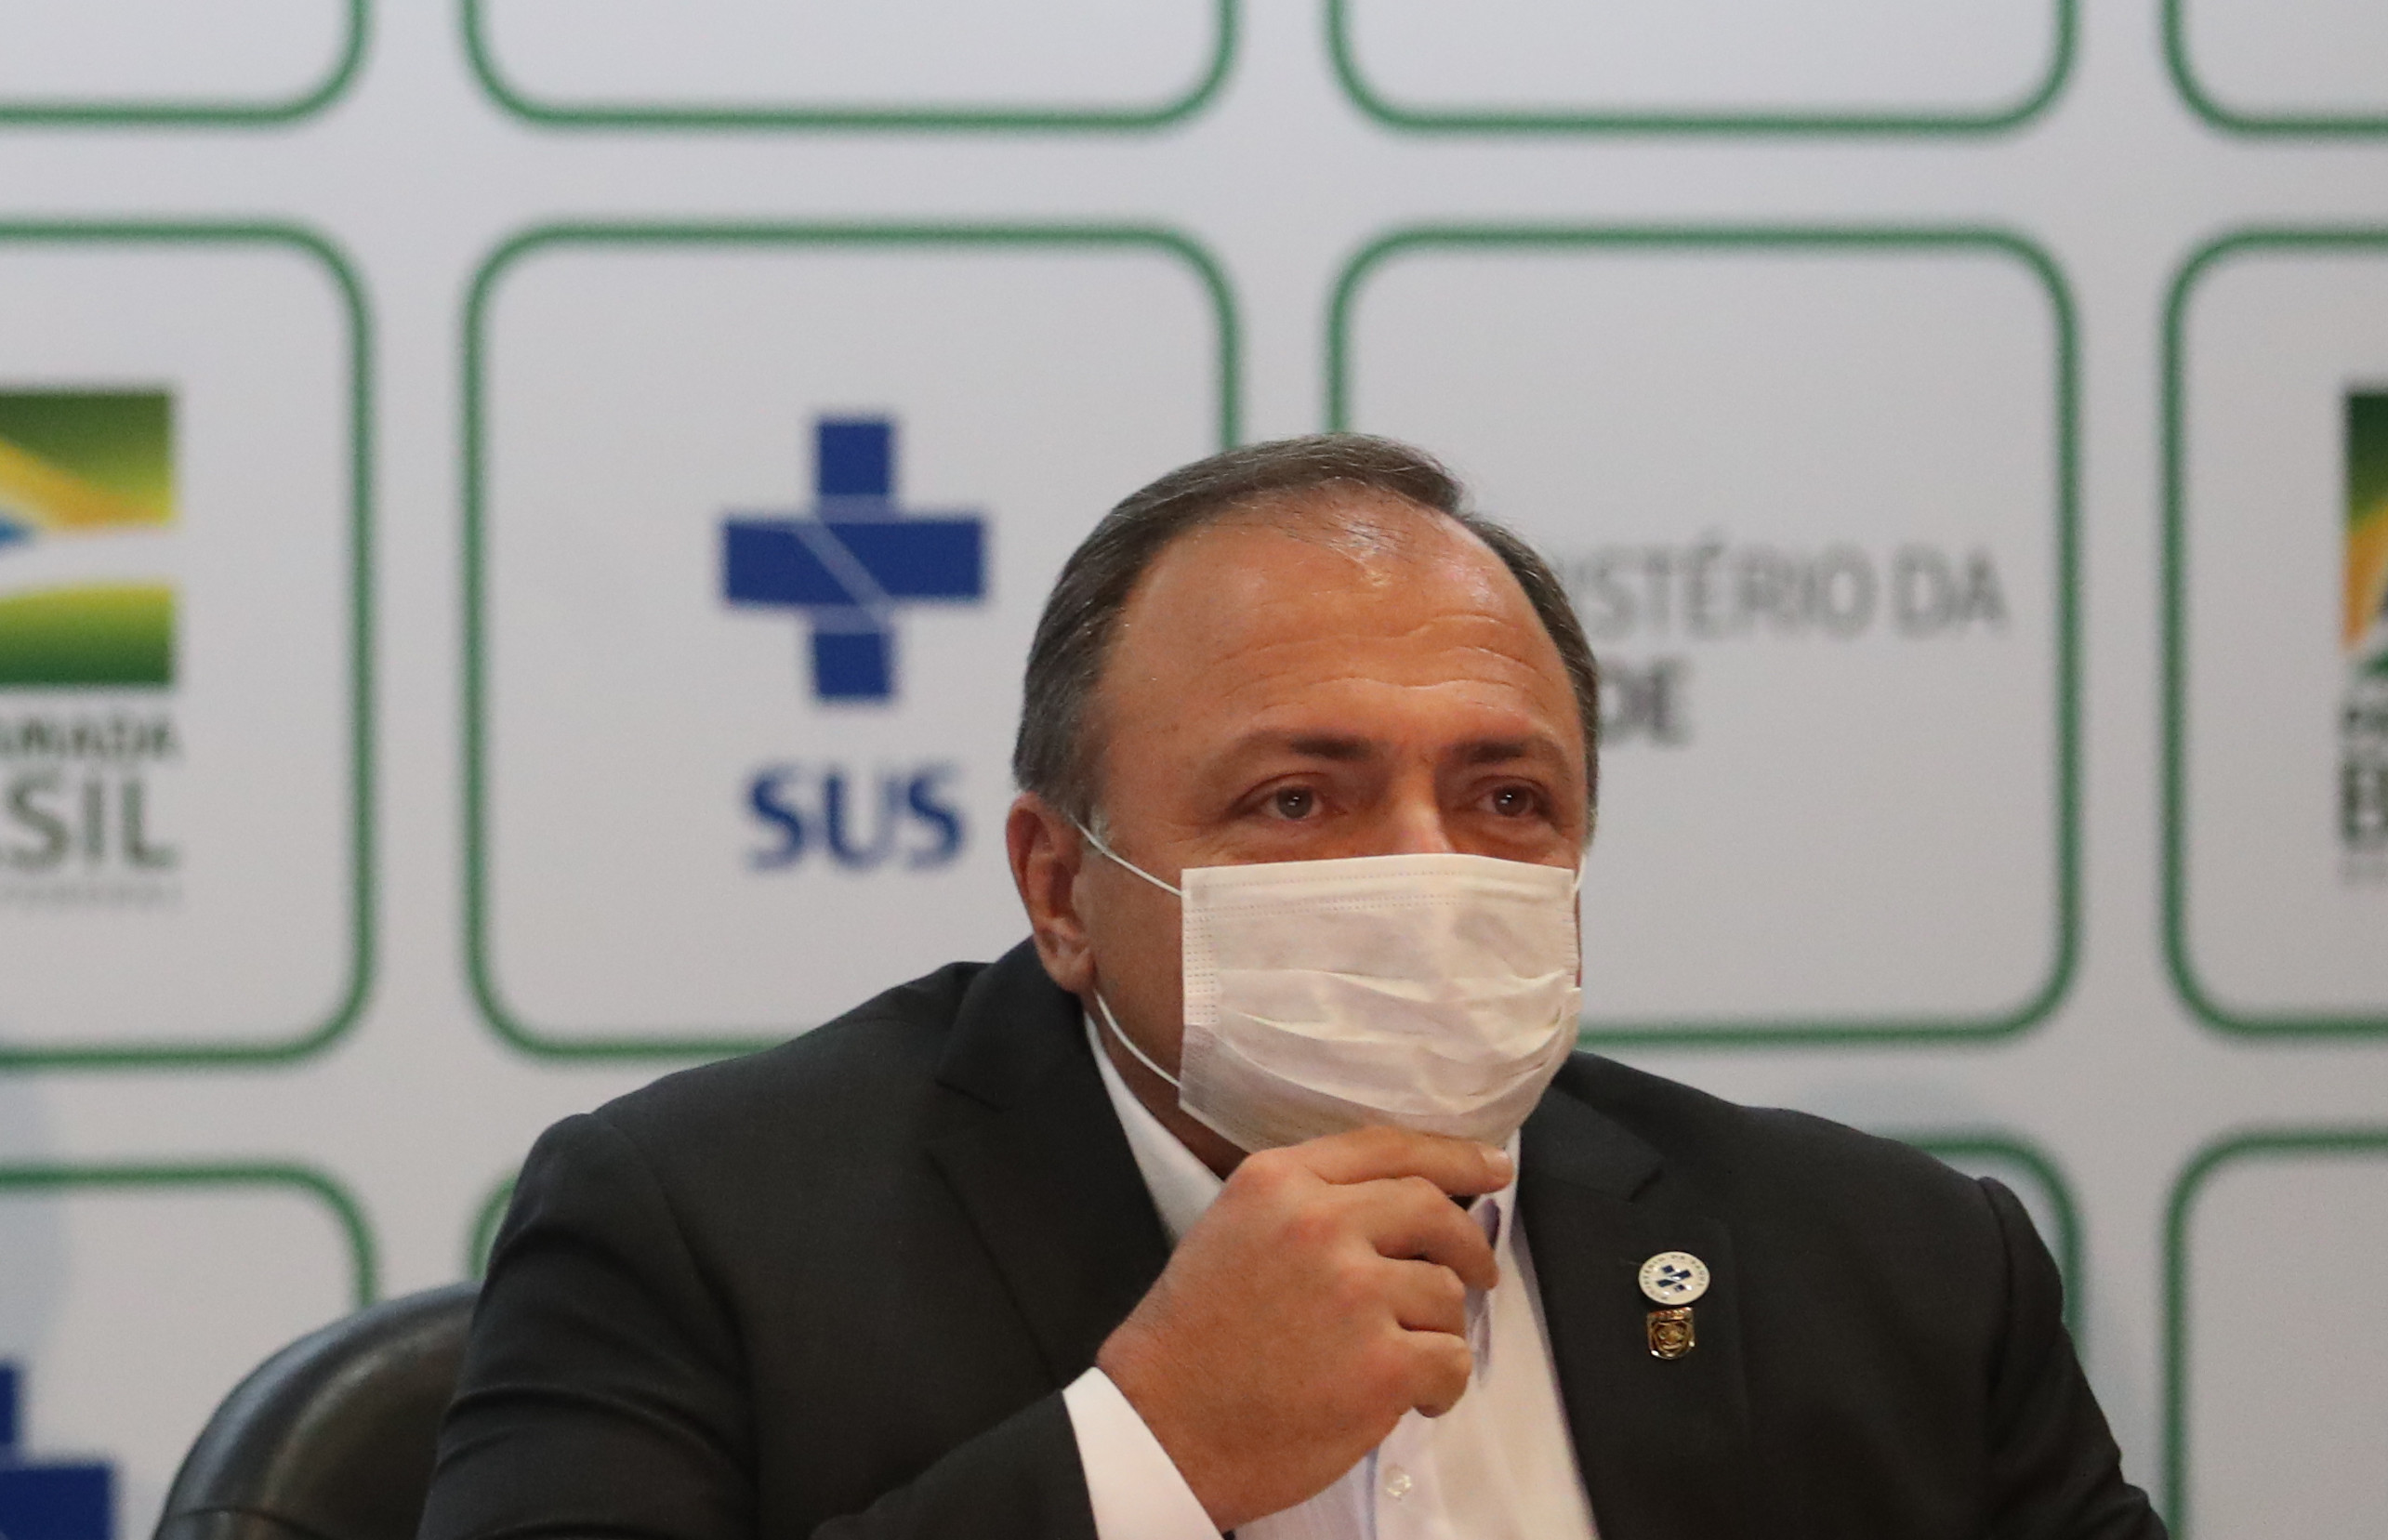 Ministro da Saúde libera cloroquina para todos os pacientes de coronavírus